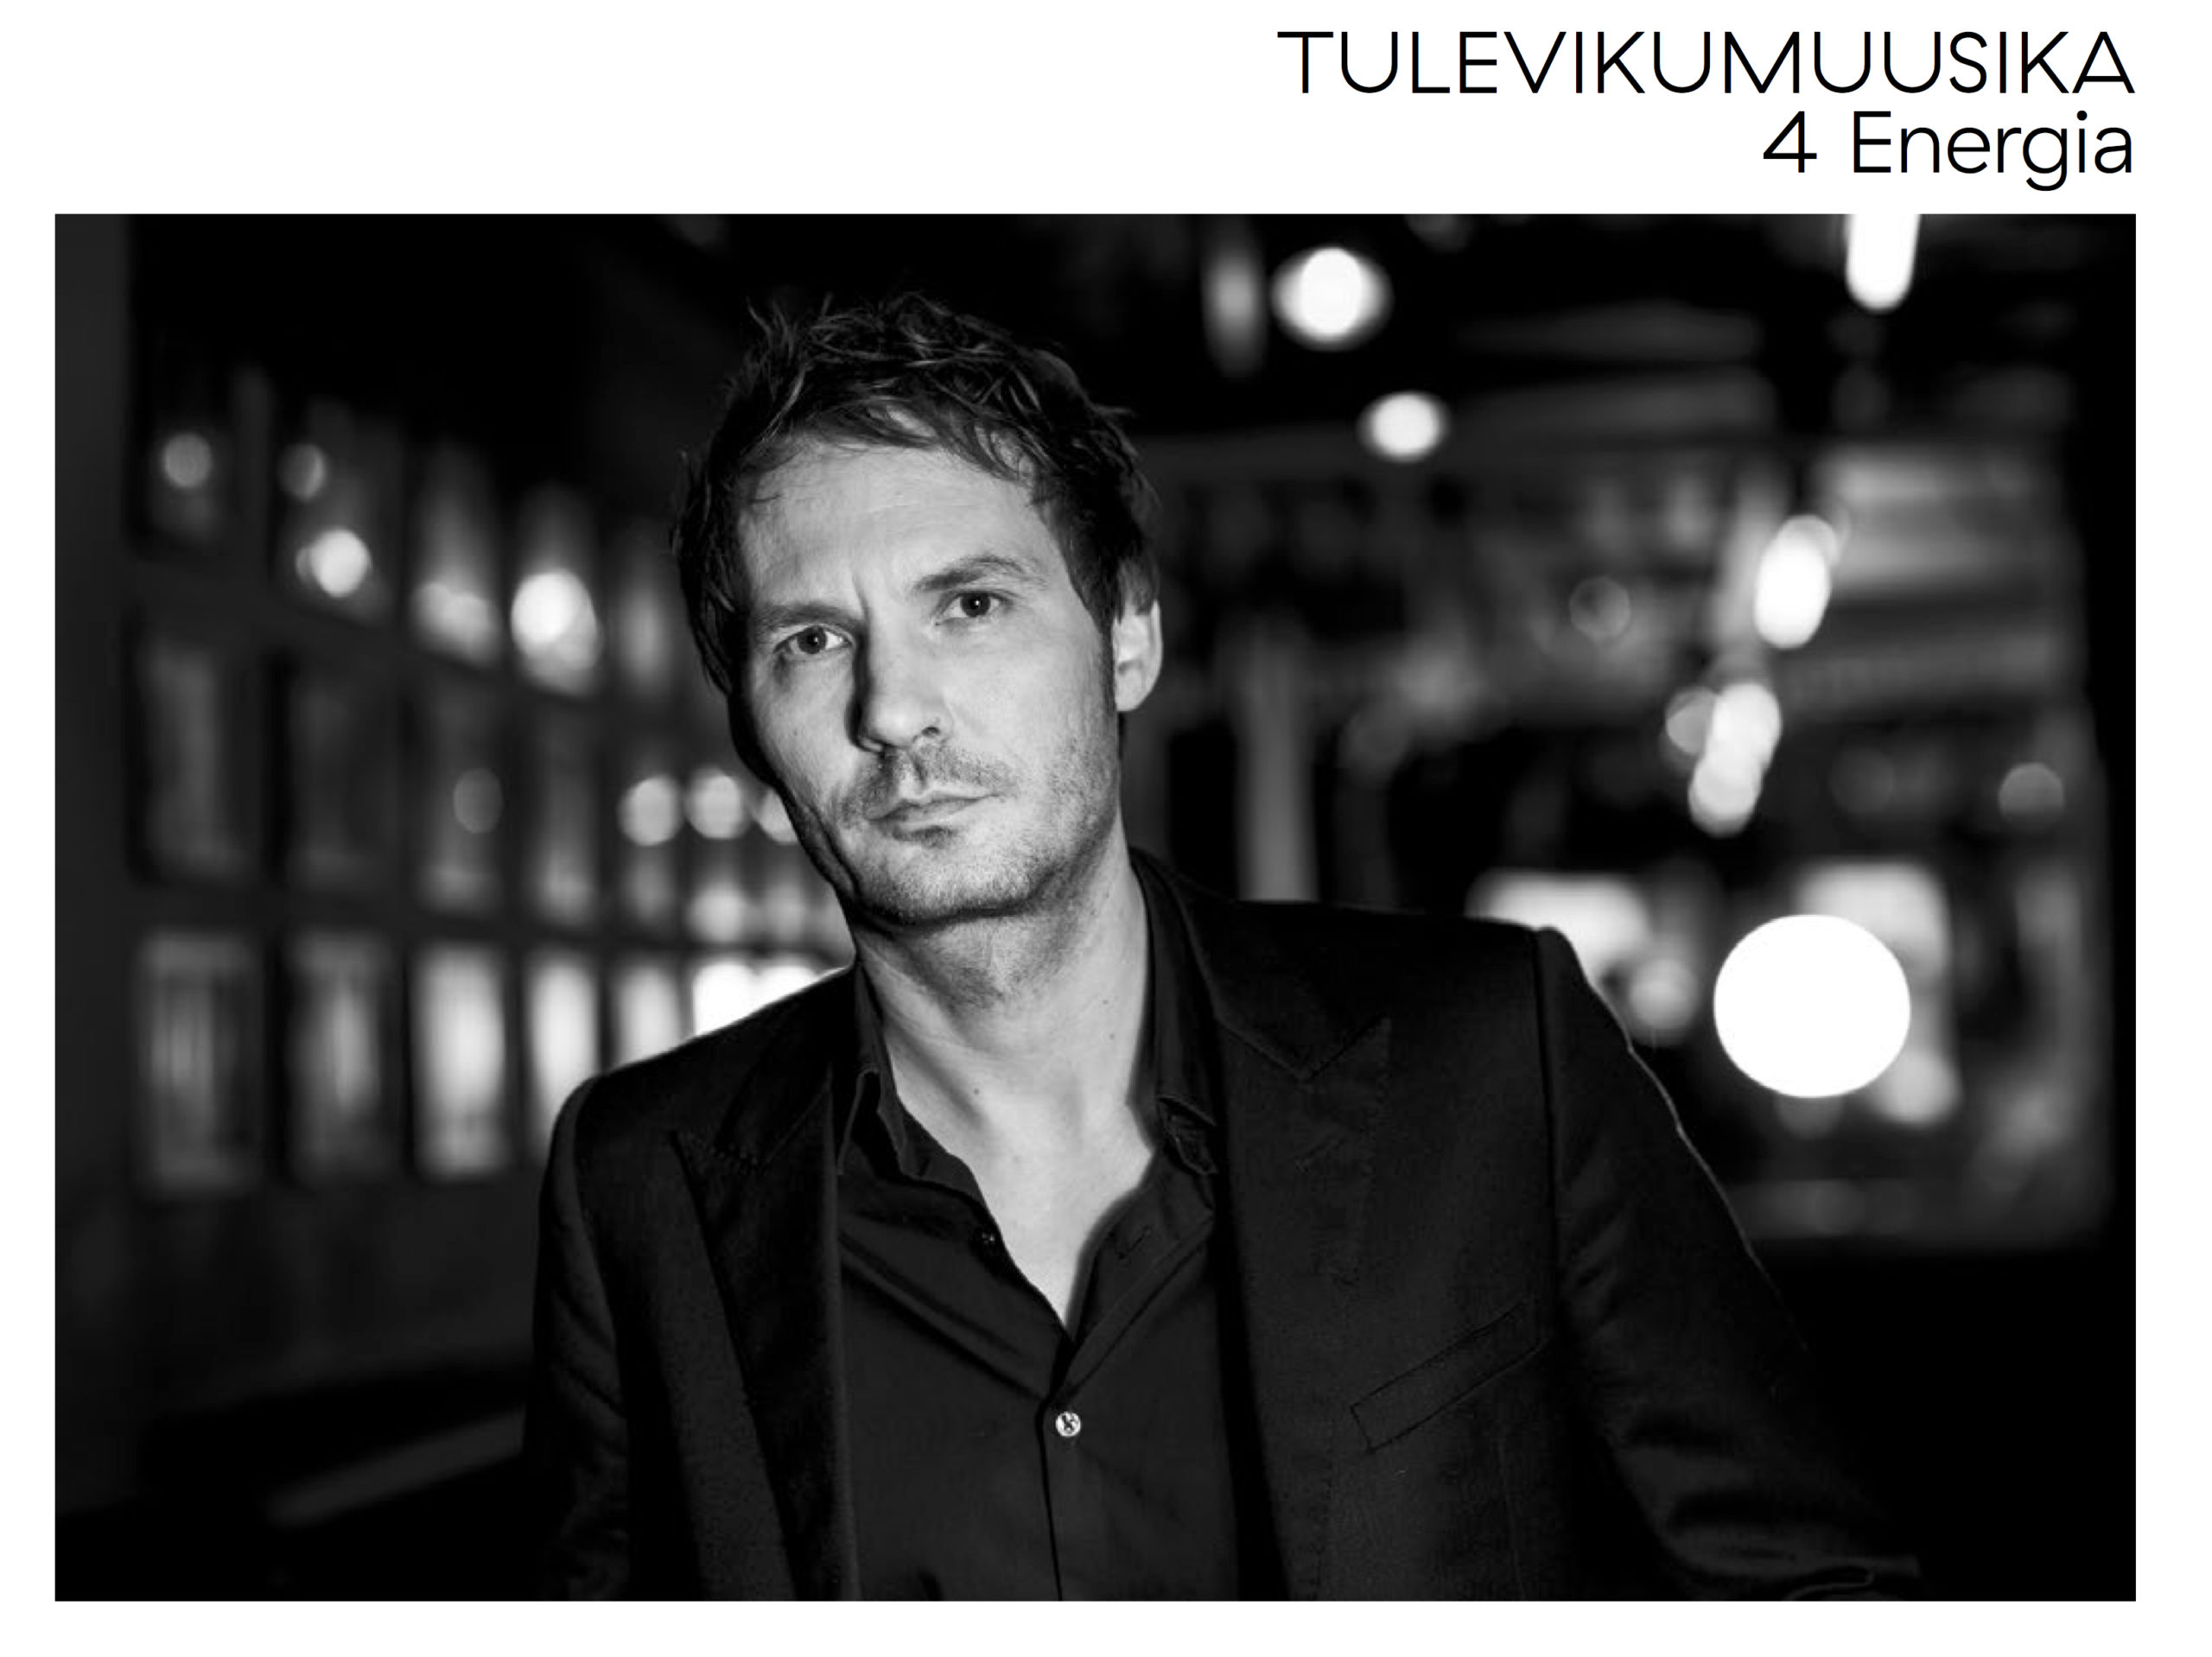 4154ERSO Tulevikumuusika / Sarjapilet IV / I EAT THE SUN AND DRINK THE RAIN